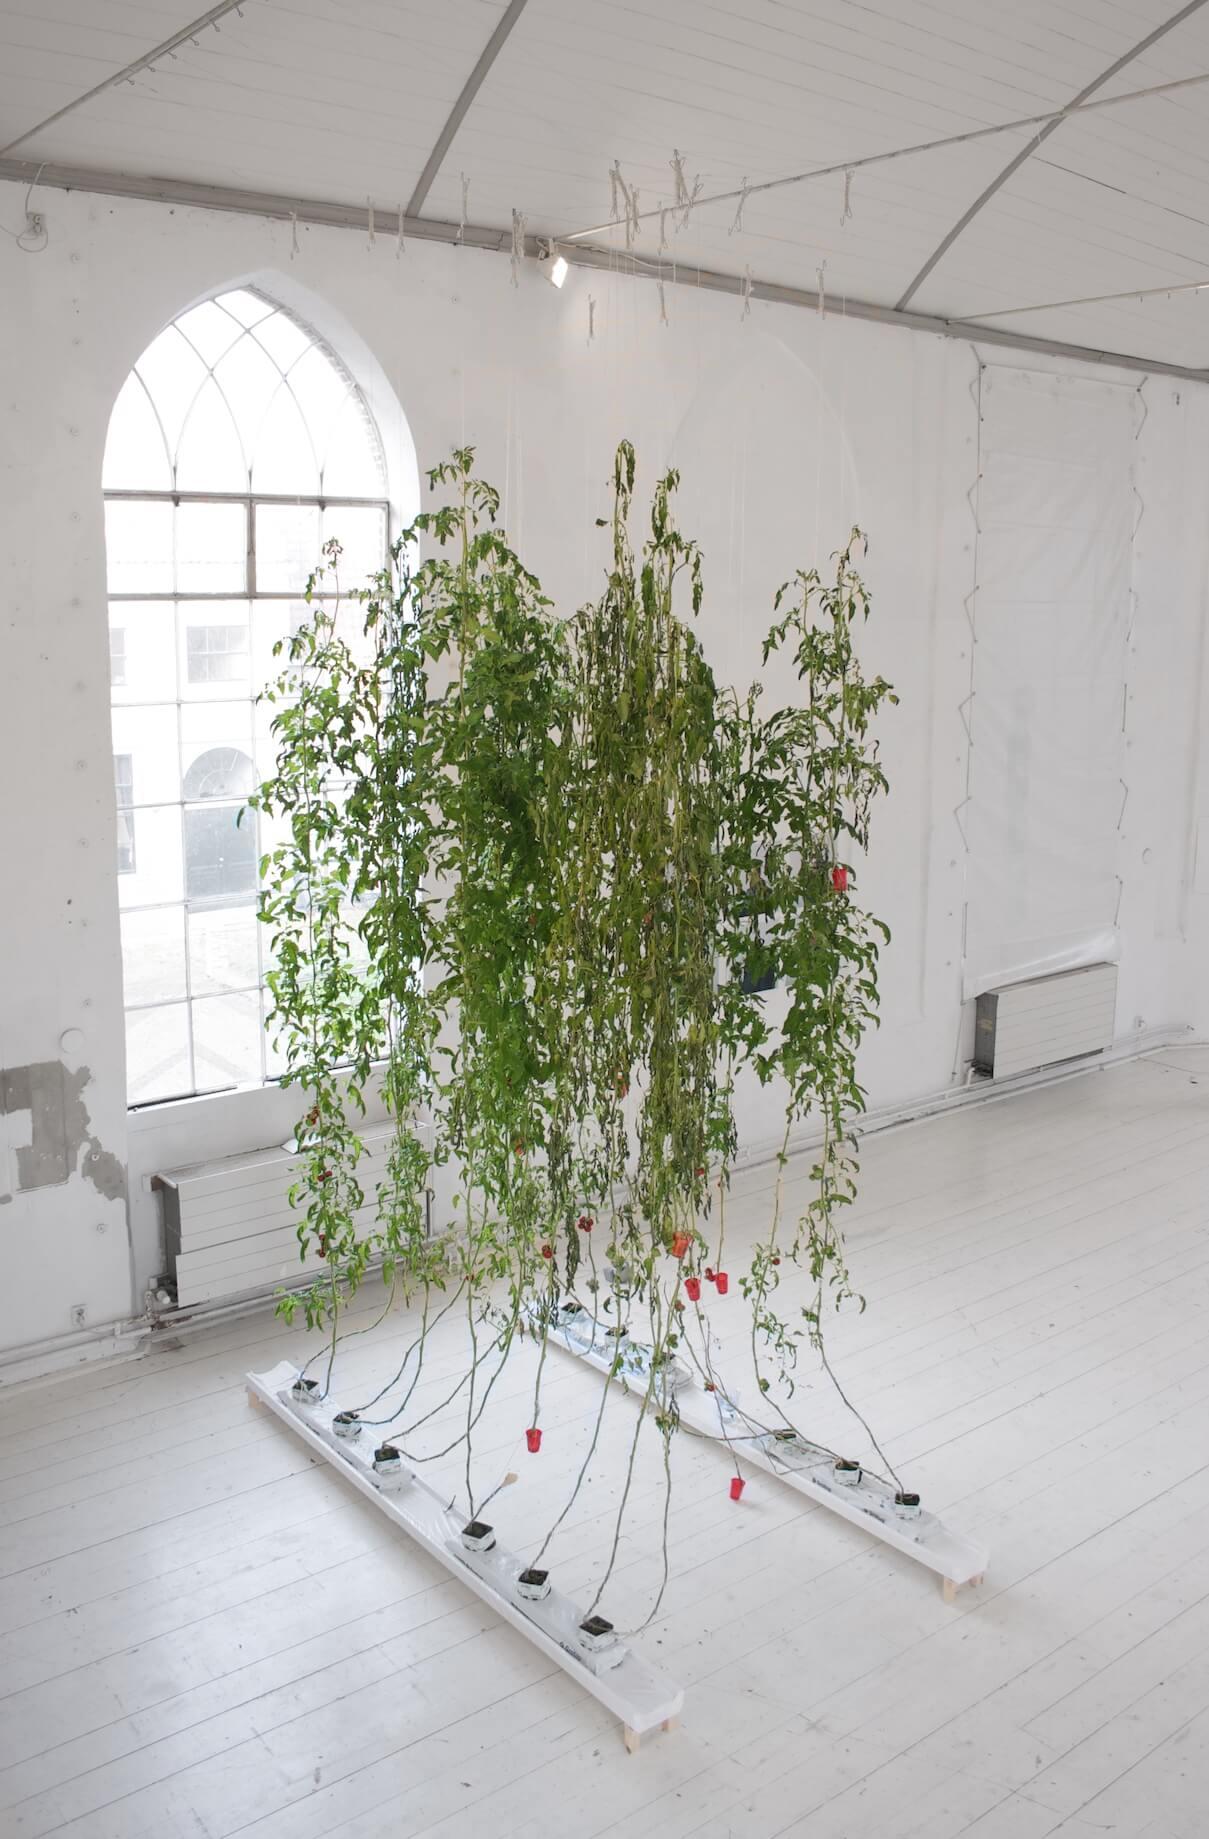 Playinggod_hoorn_meenan_plantart_contemporyart_installation_art_tomatoes_IMG_7866.jpg